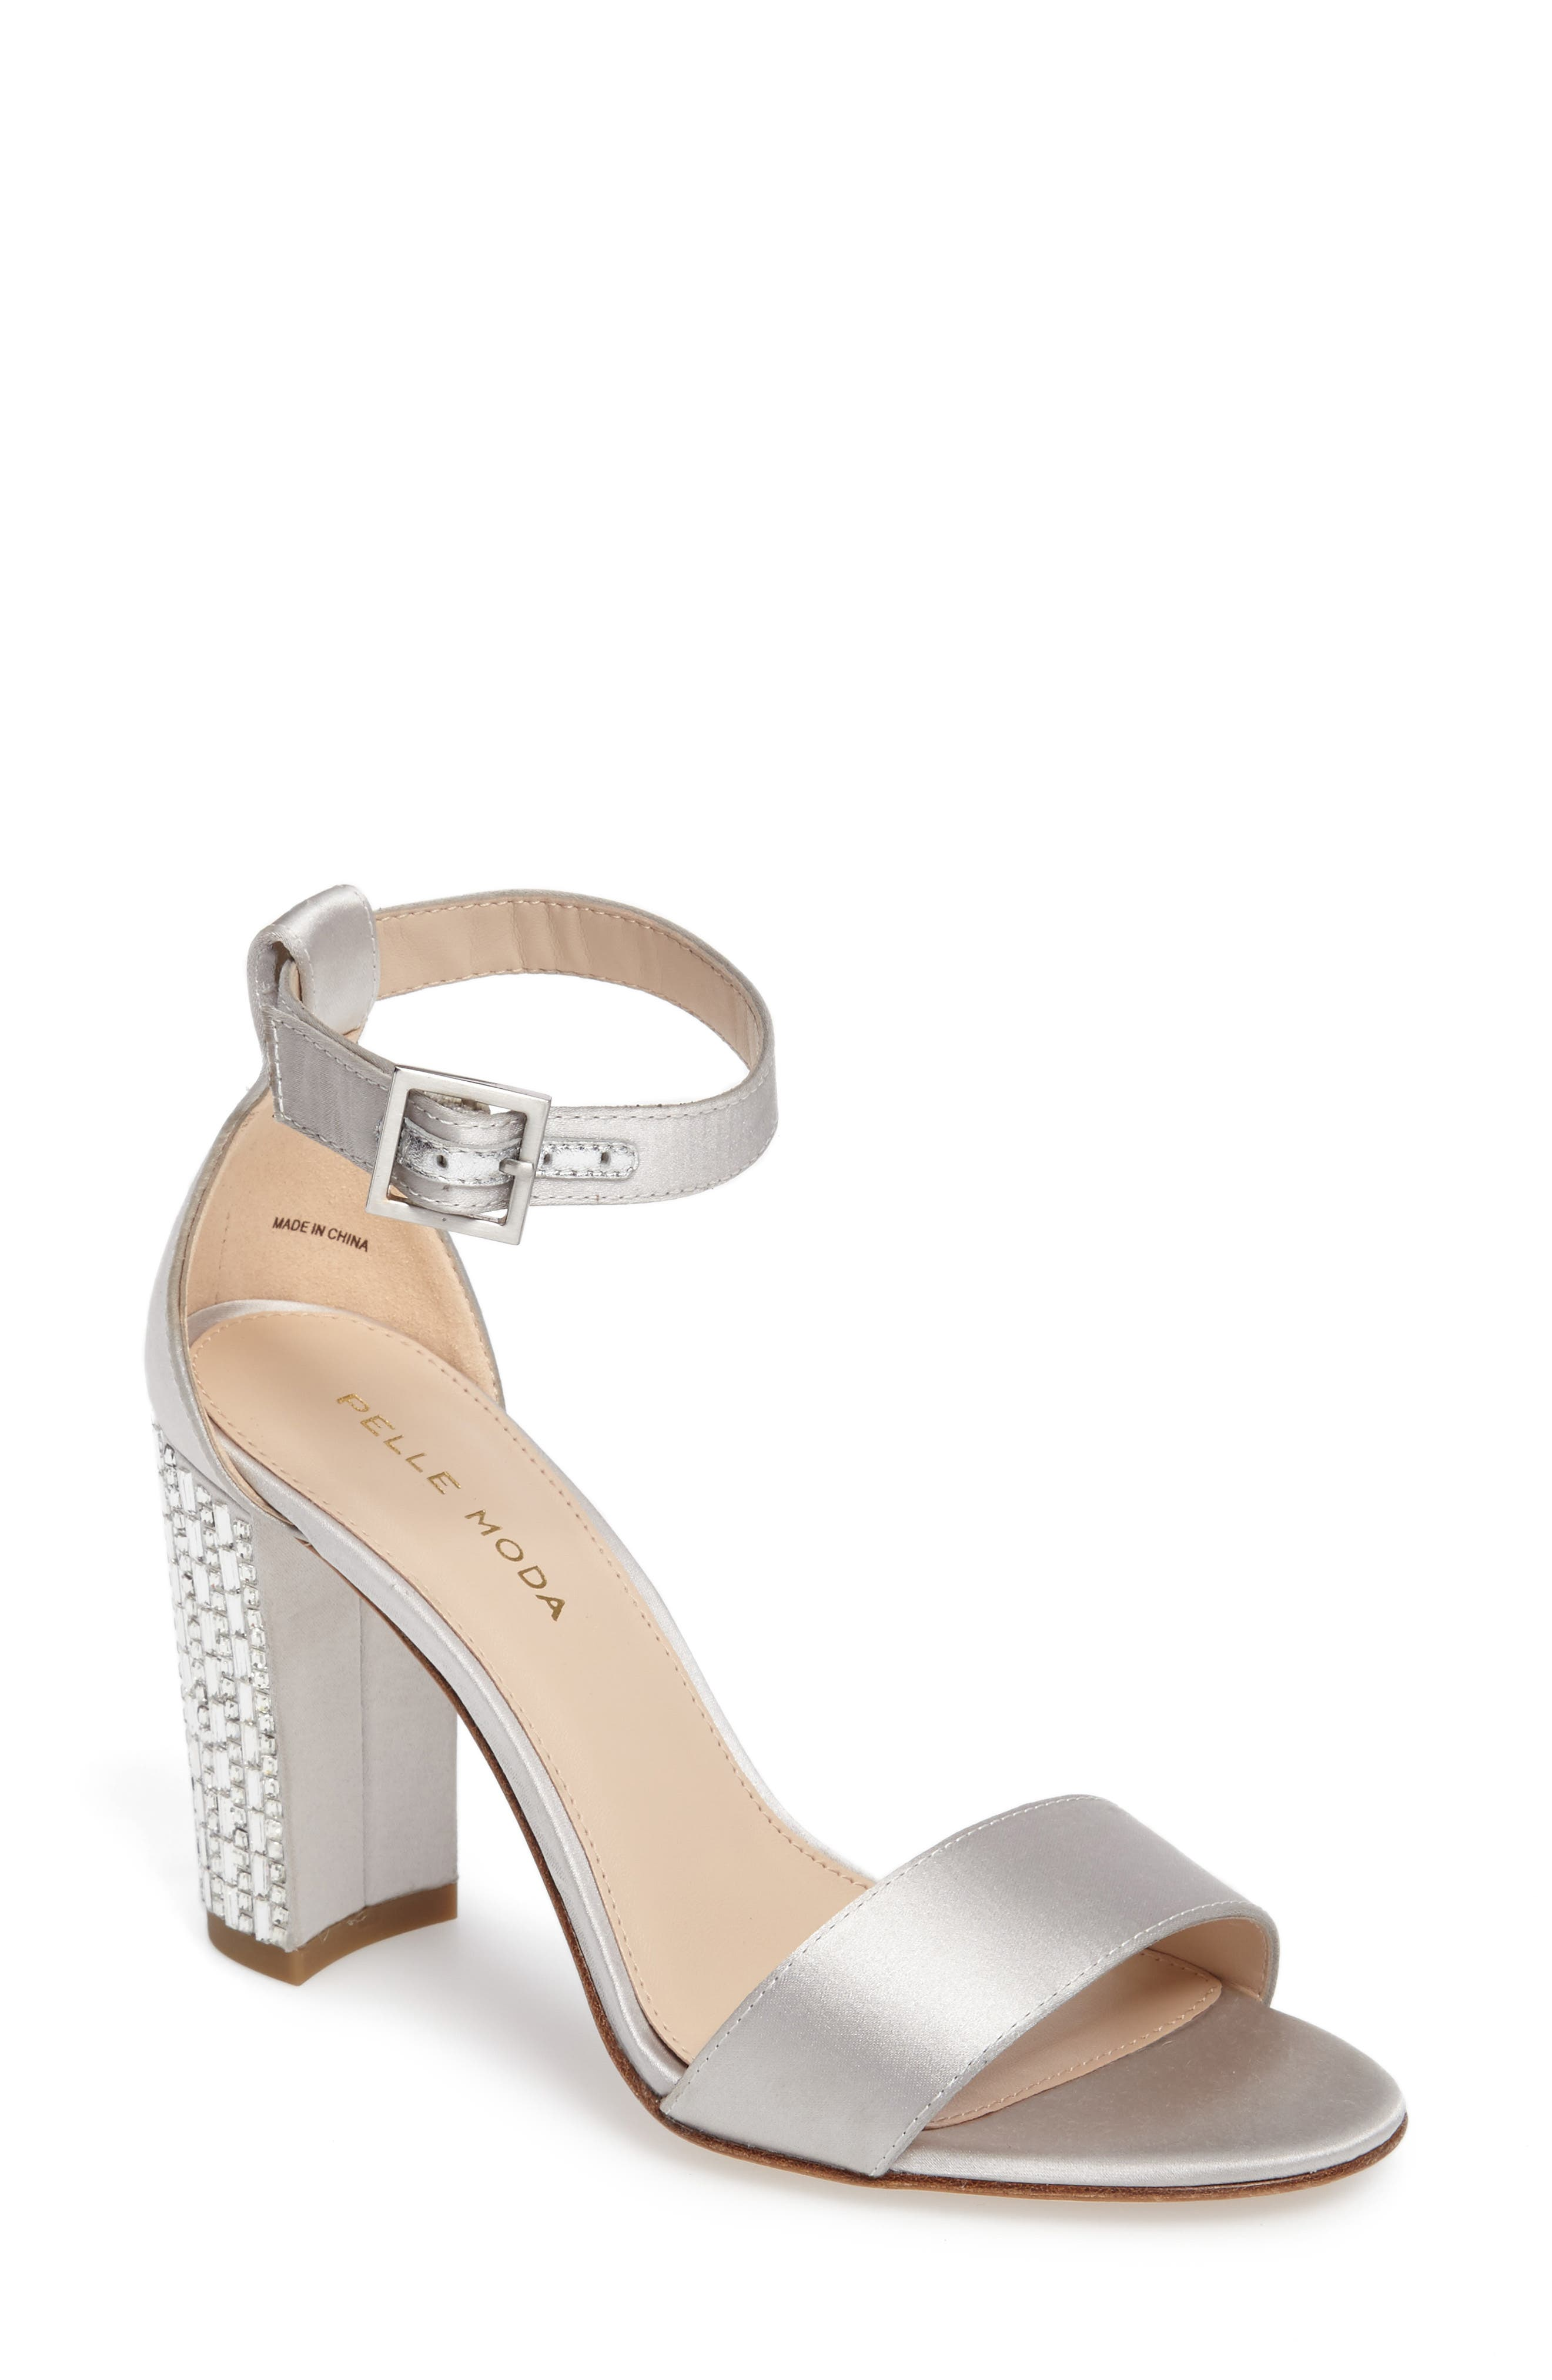 Alternate Image 1 Selected - Pelle Moda Bonnie 3 Embellished Ankle Strap Sandal (Women)